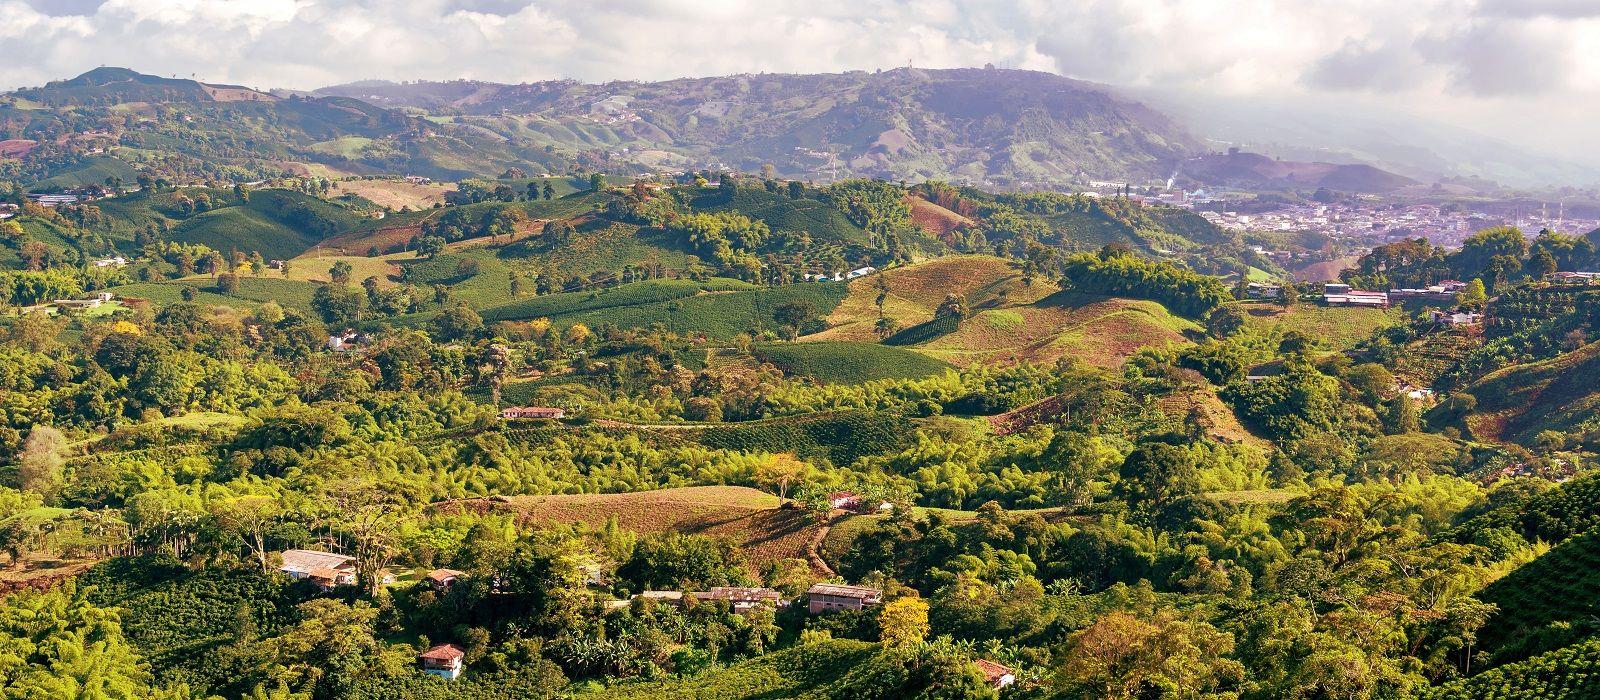 Kulturelles Ecuador und bezauberndes Kolumbien Urlaub 2